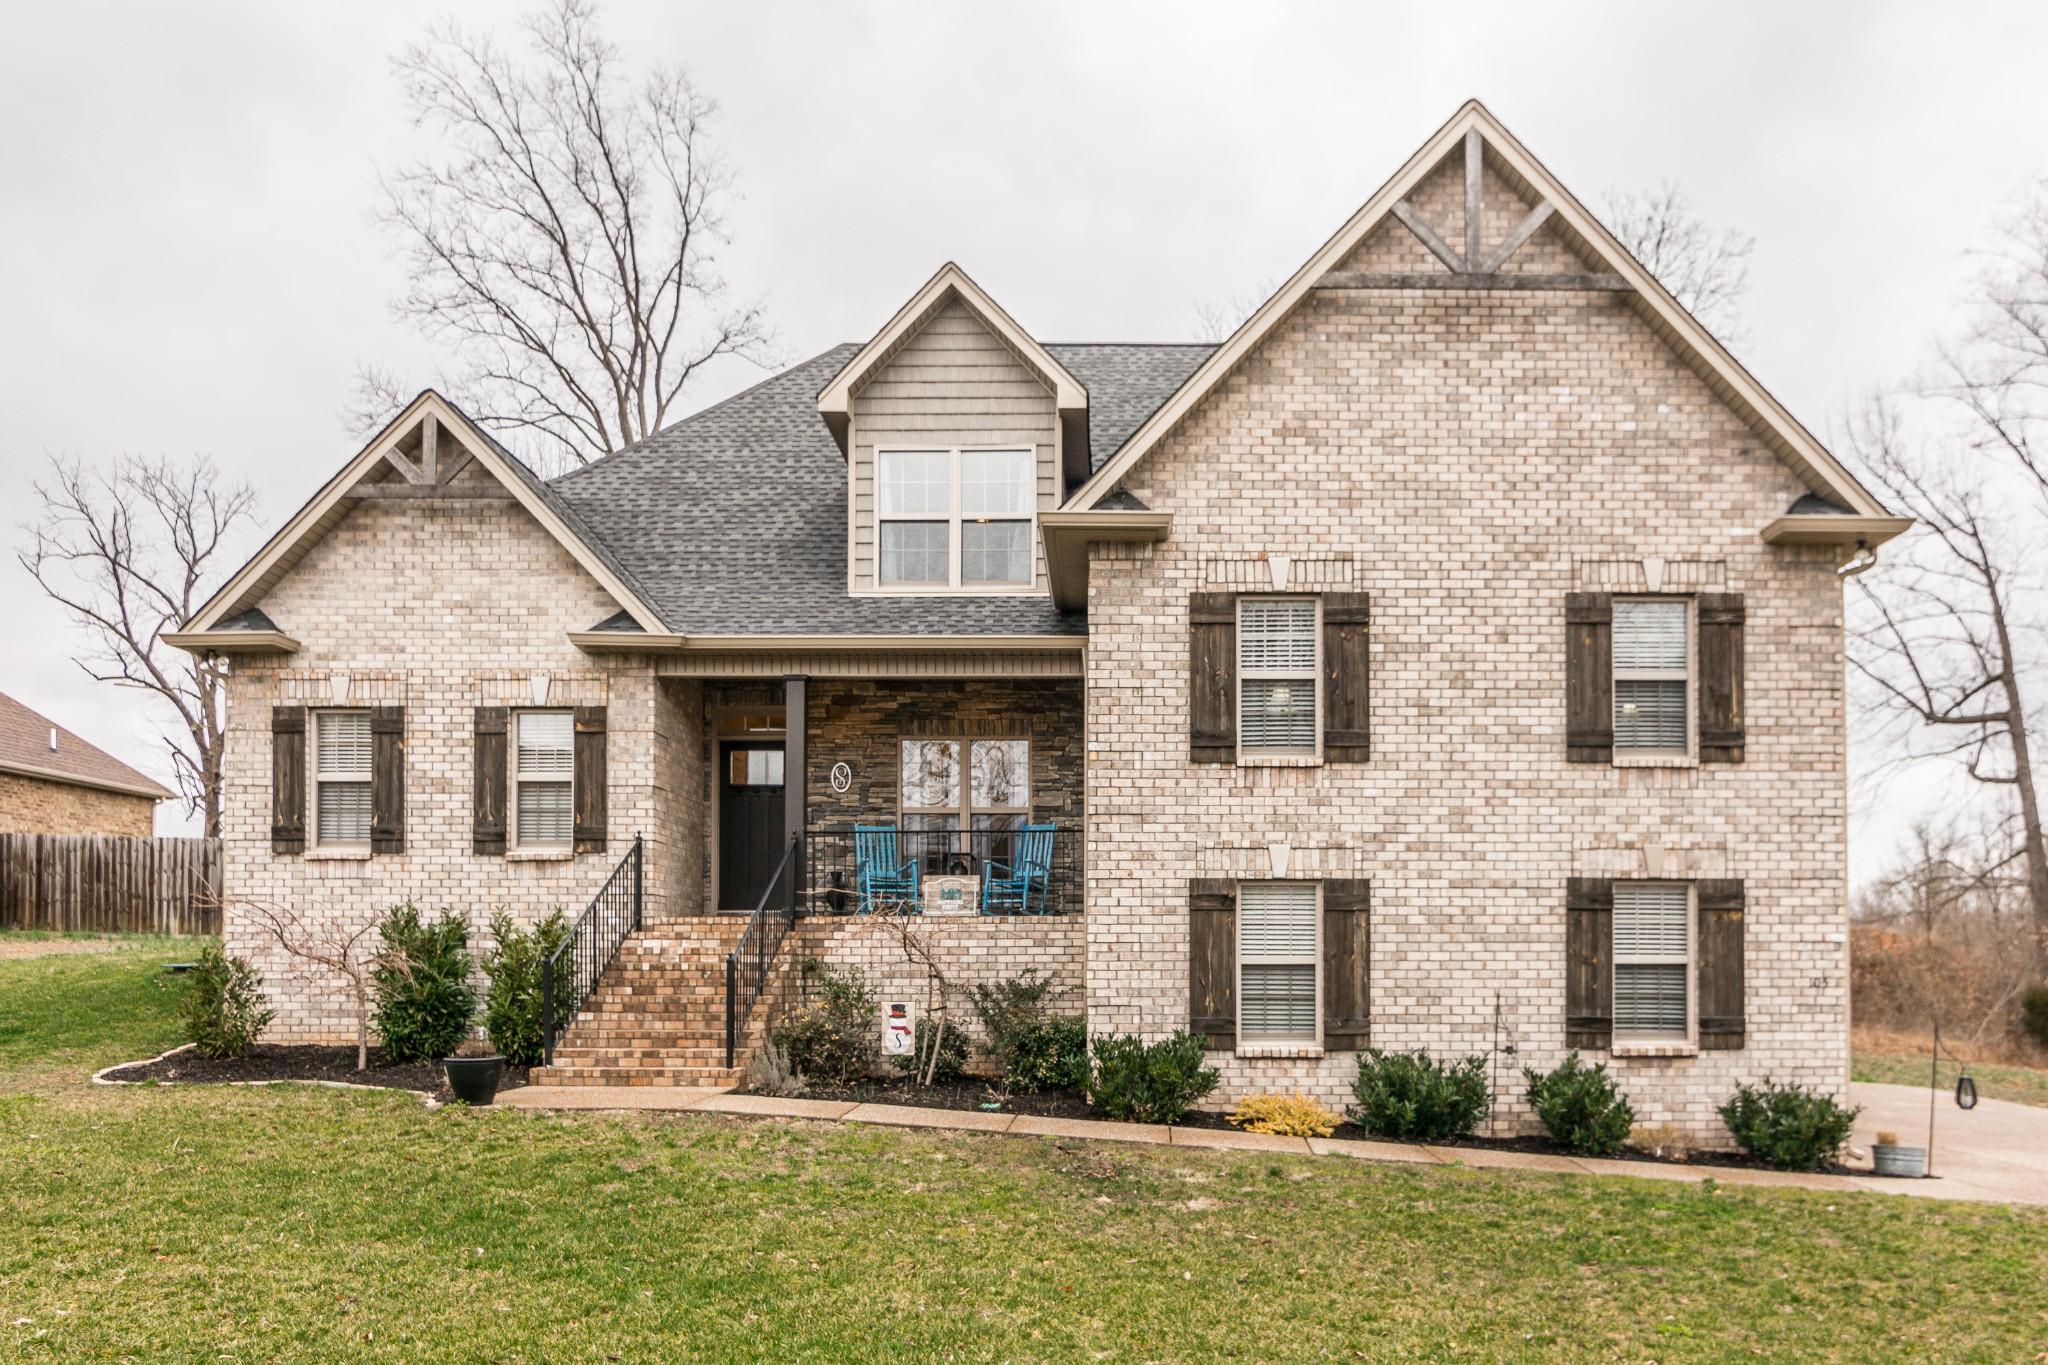 105 Sapphire Dr, White House, TN 37188 - White House, TN real estate listing